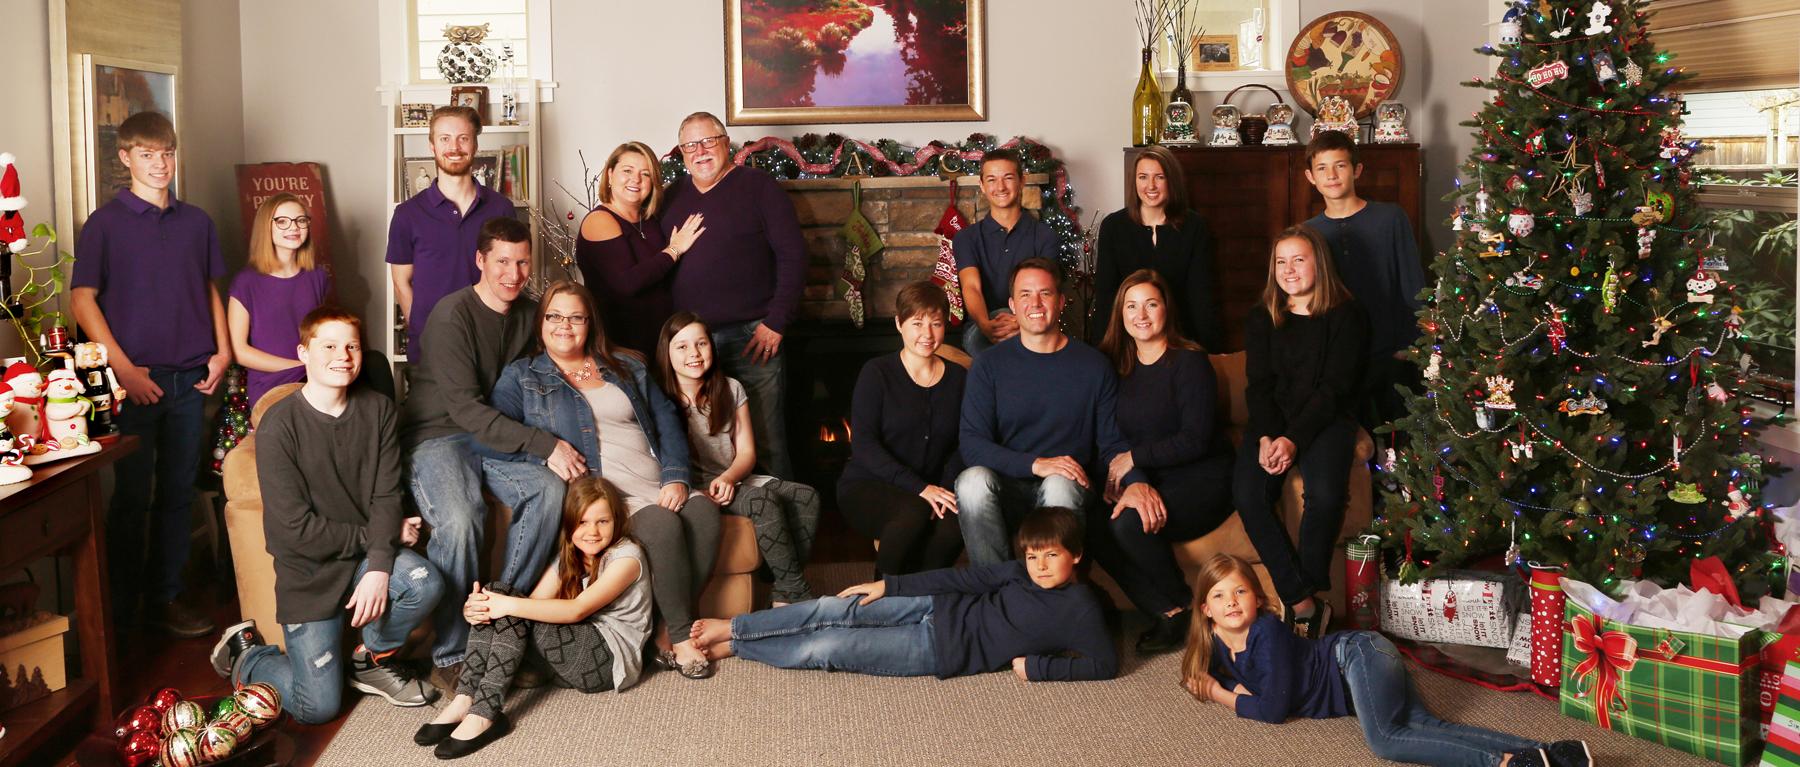 multiple generations Family Portraits Eugene Oregon professional photographer.jpg